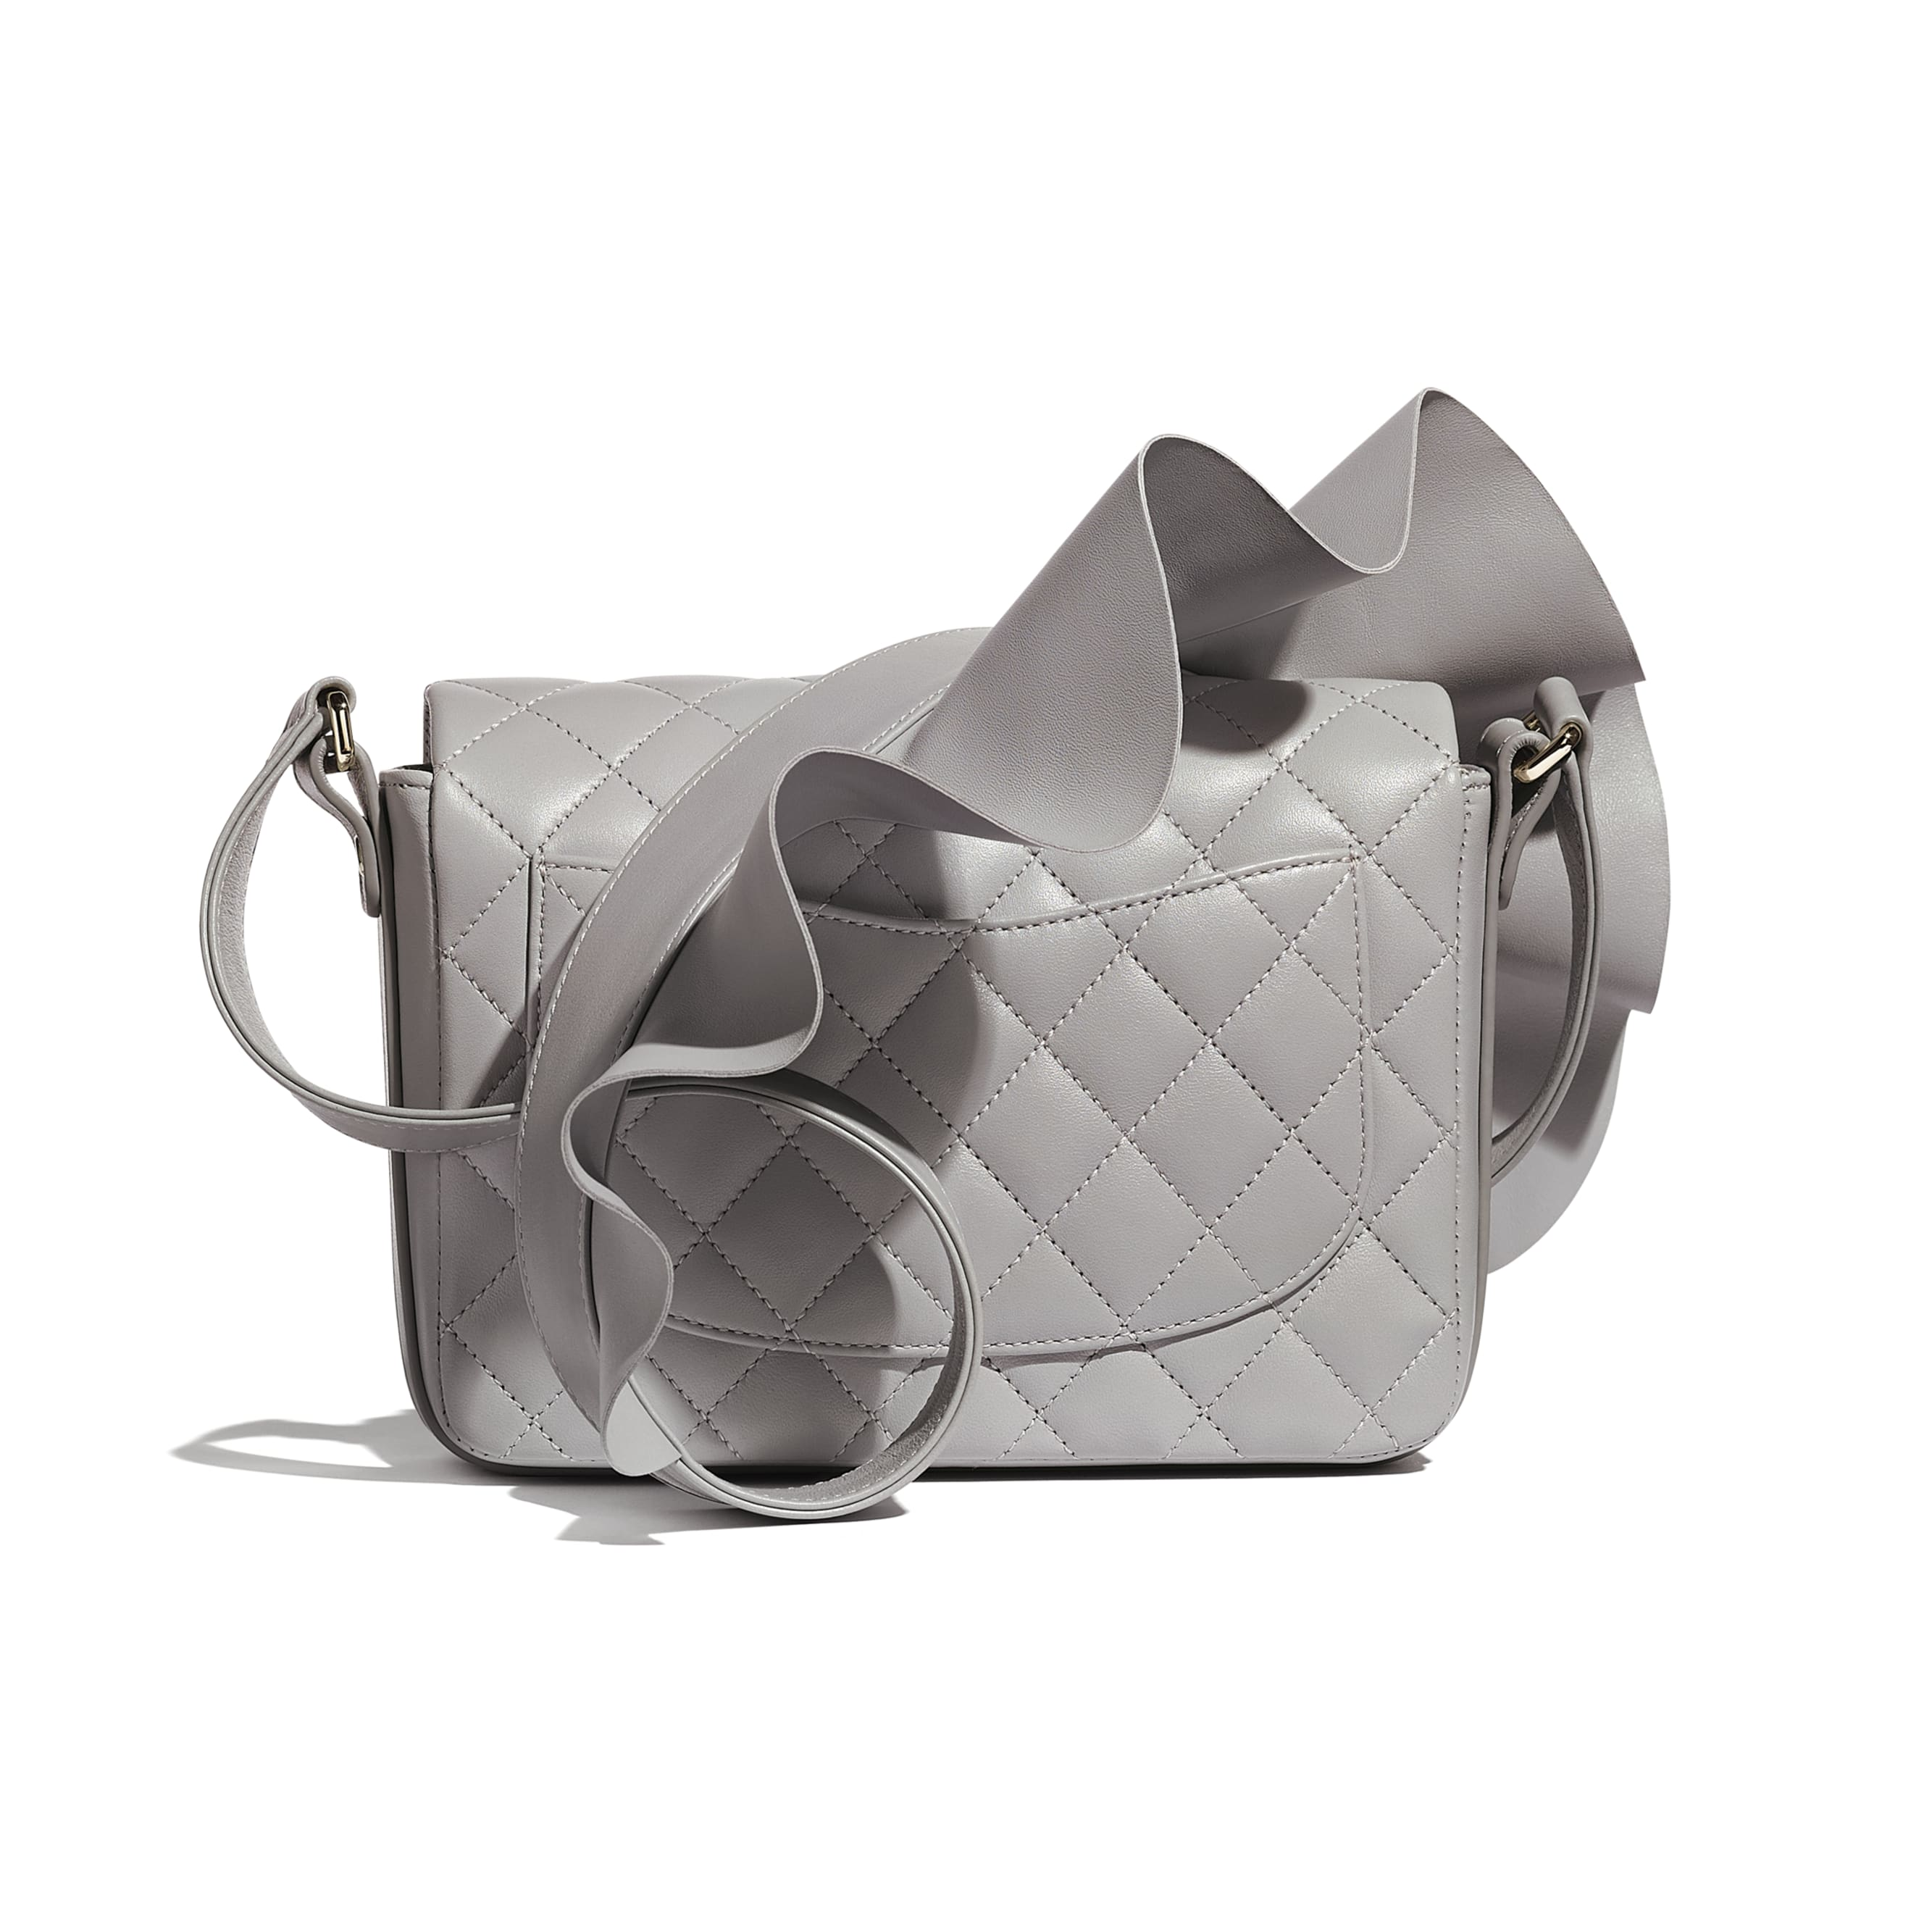 Flap Bag - Light Grey - Lambskin, Calfskin & Gold-Tone Metal - Alternative view - see standard sized version